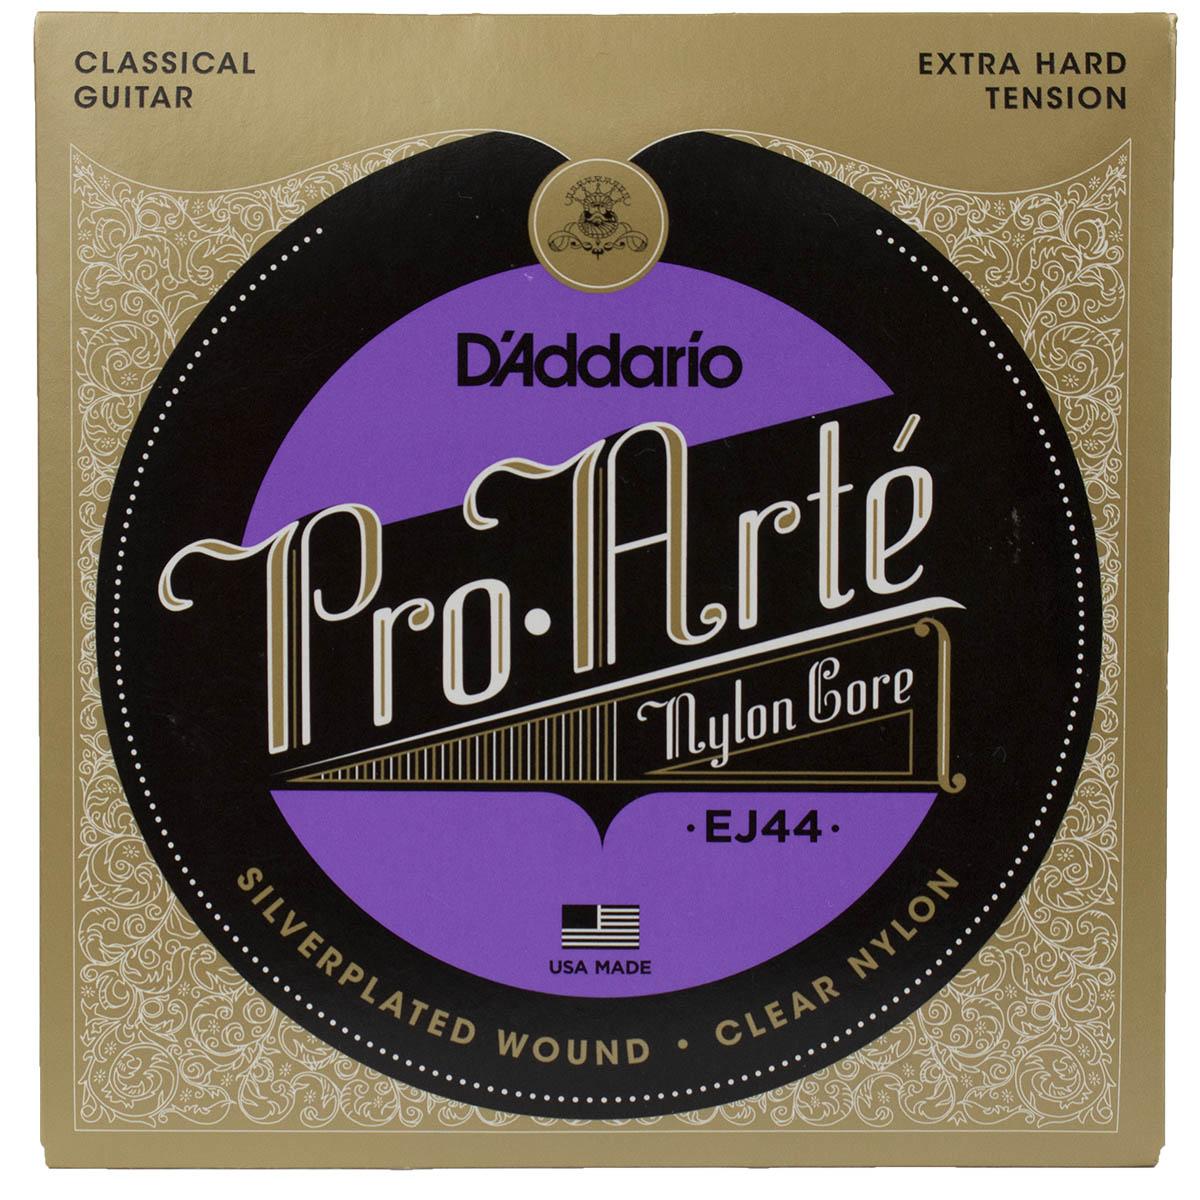 Encordoamento Violão Nylon Daddario Pro Arte Ej44 Extra Alta